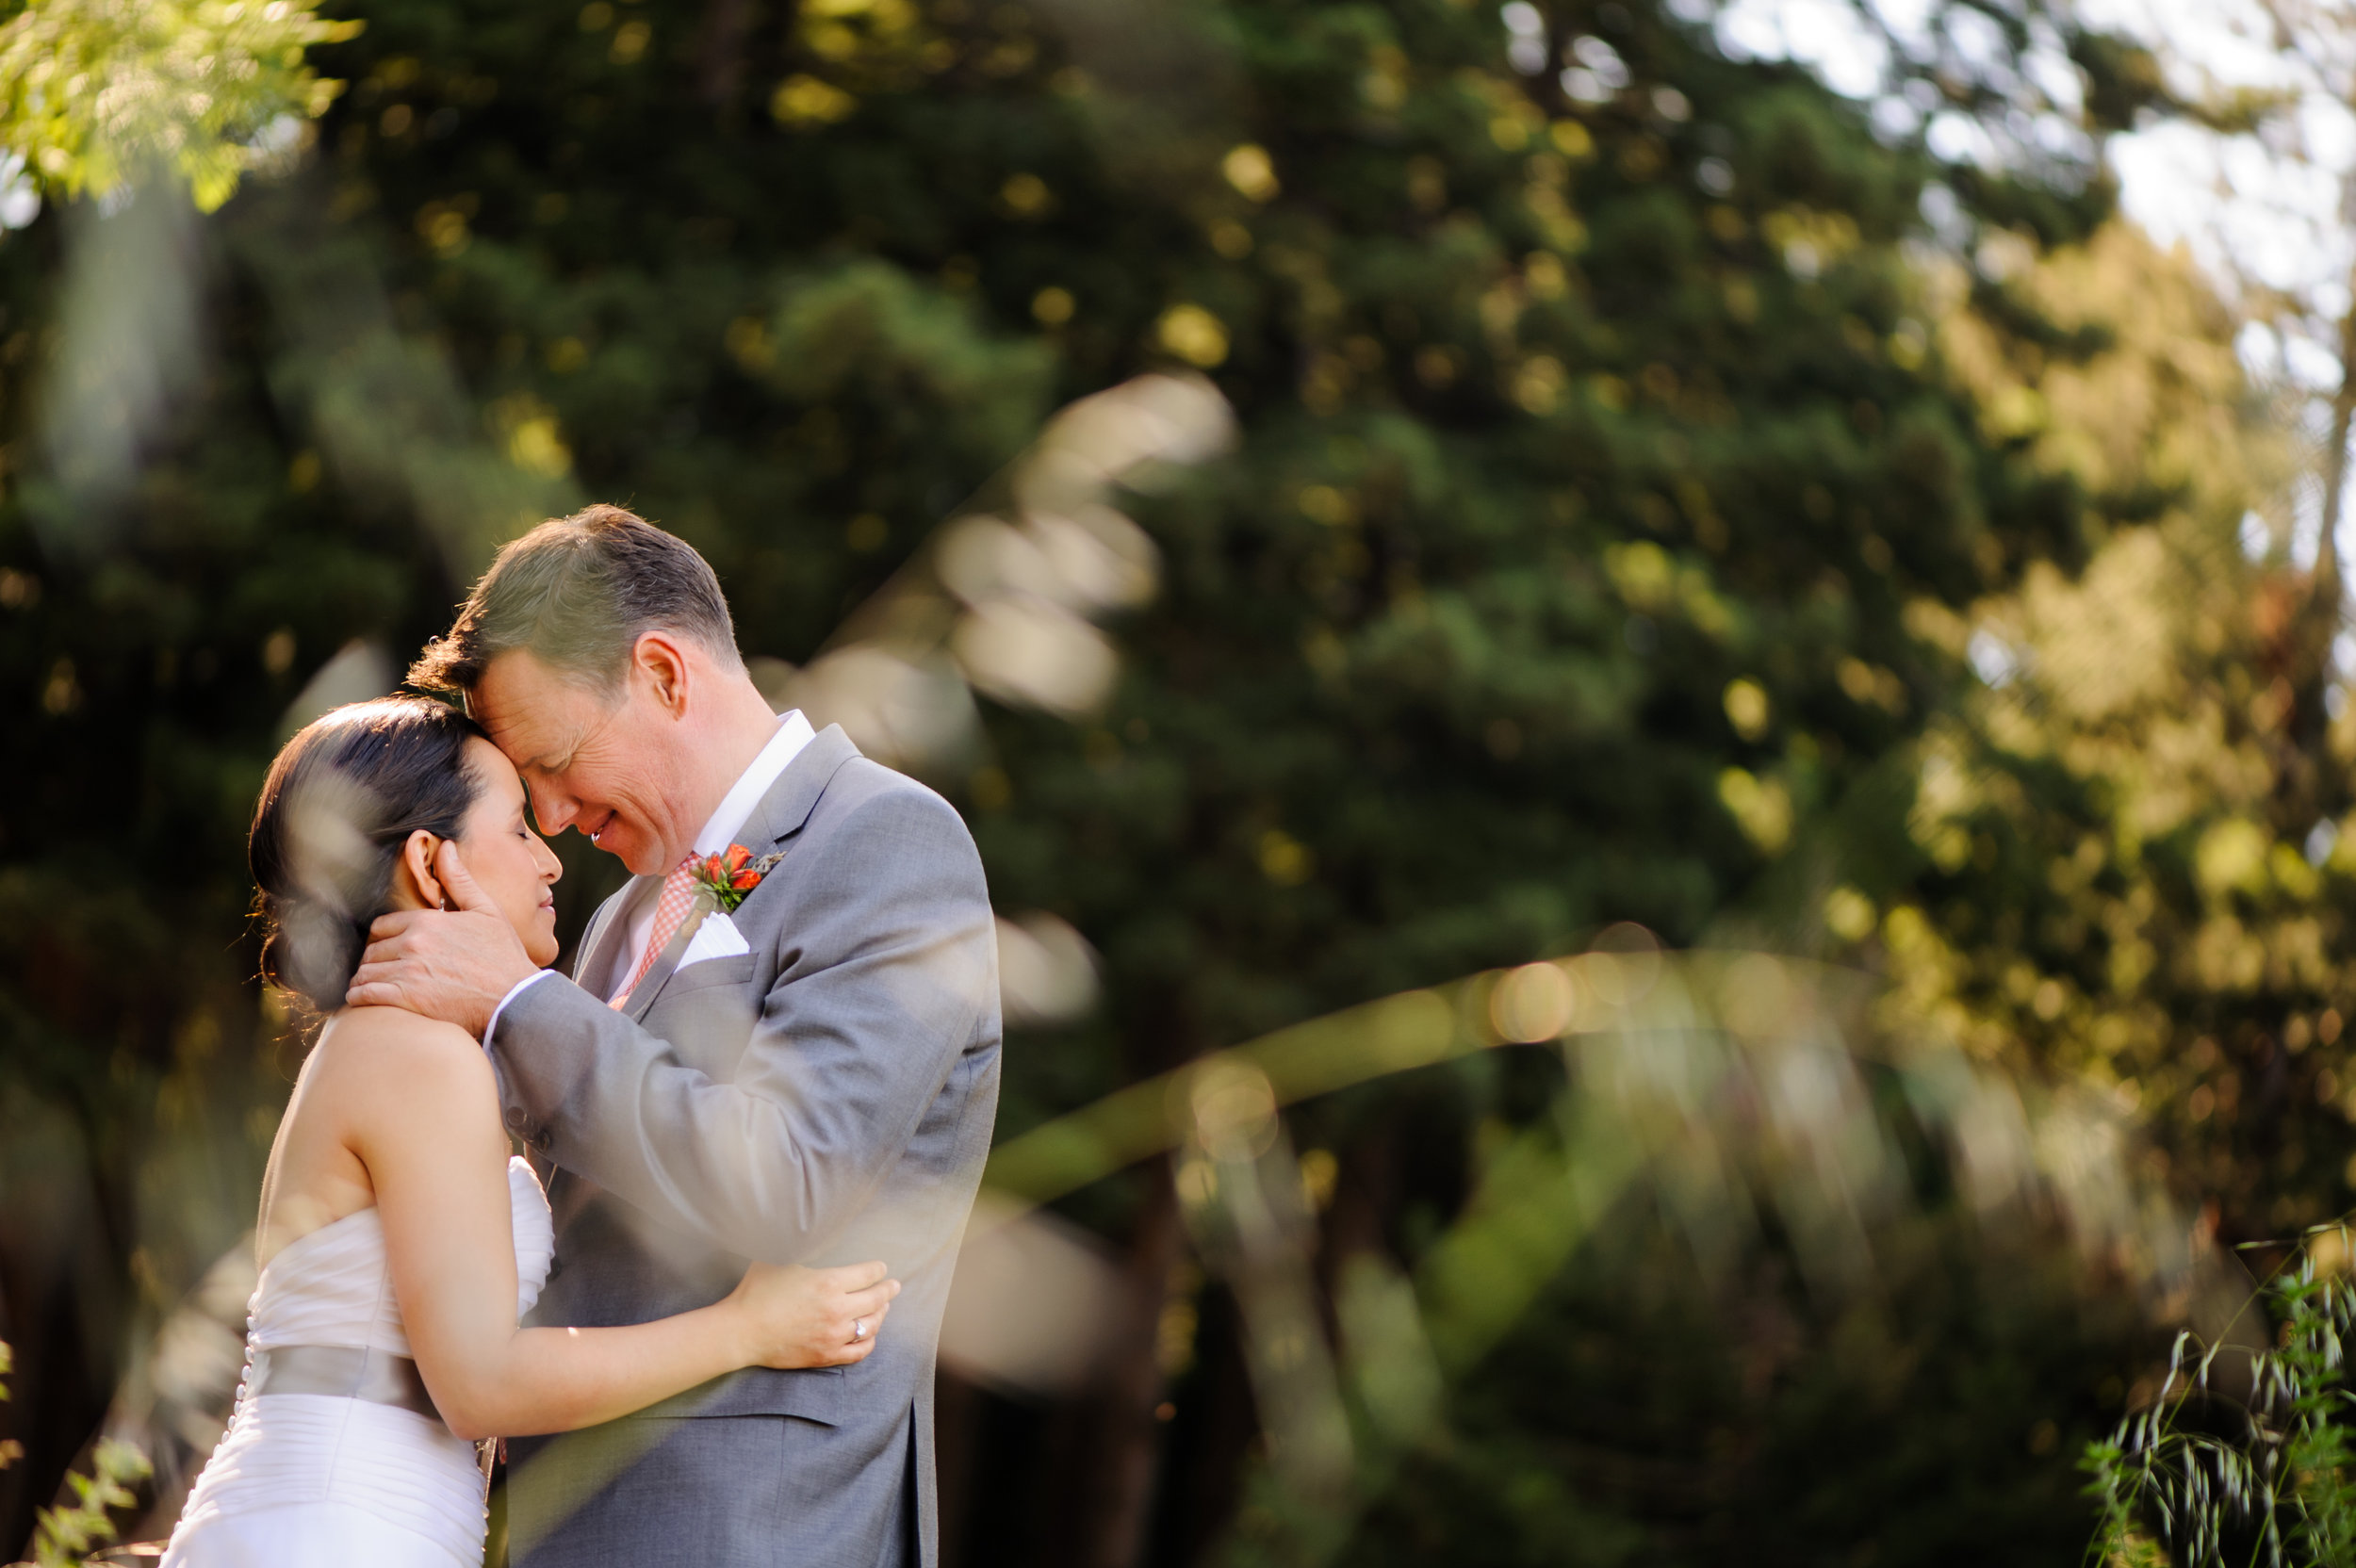 janet-jeremy-013-mountain-terrace-woodside-wedding-photographer-katherine-nicole-photography.JPG